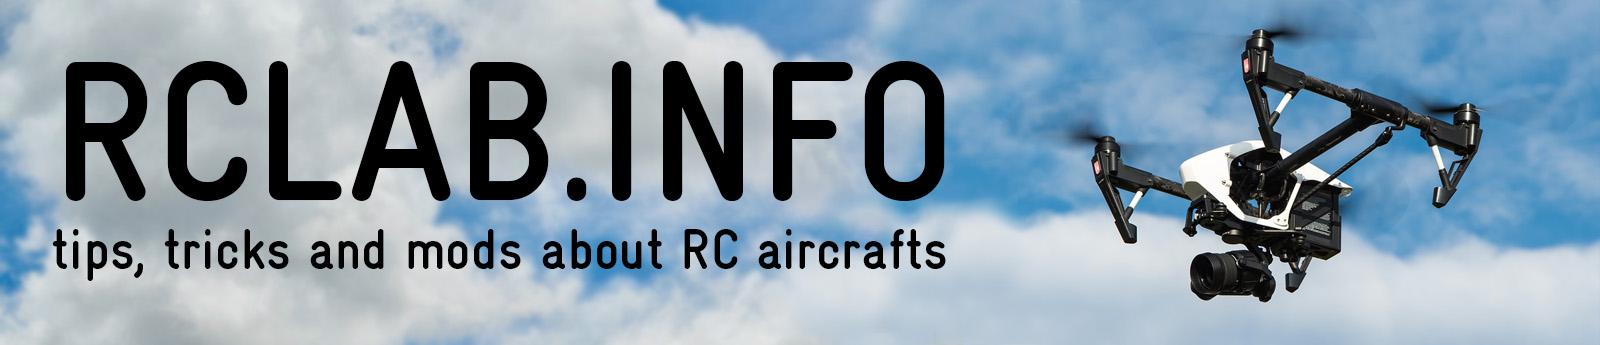 RCLab.info